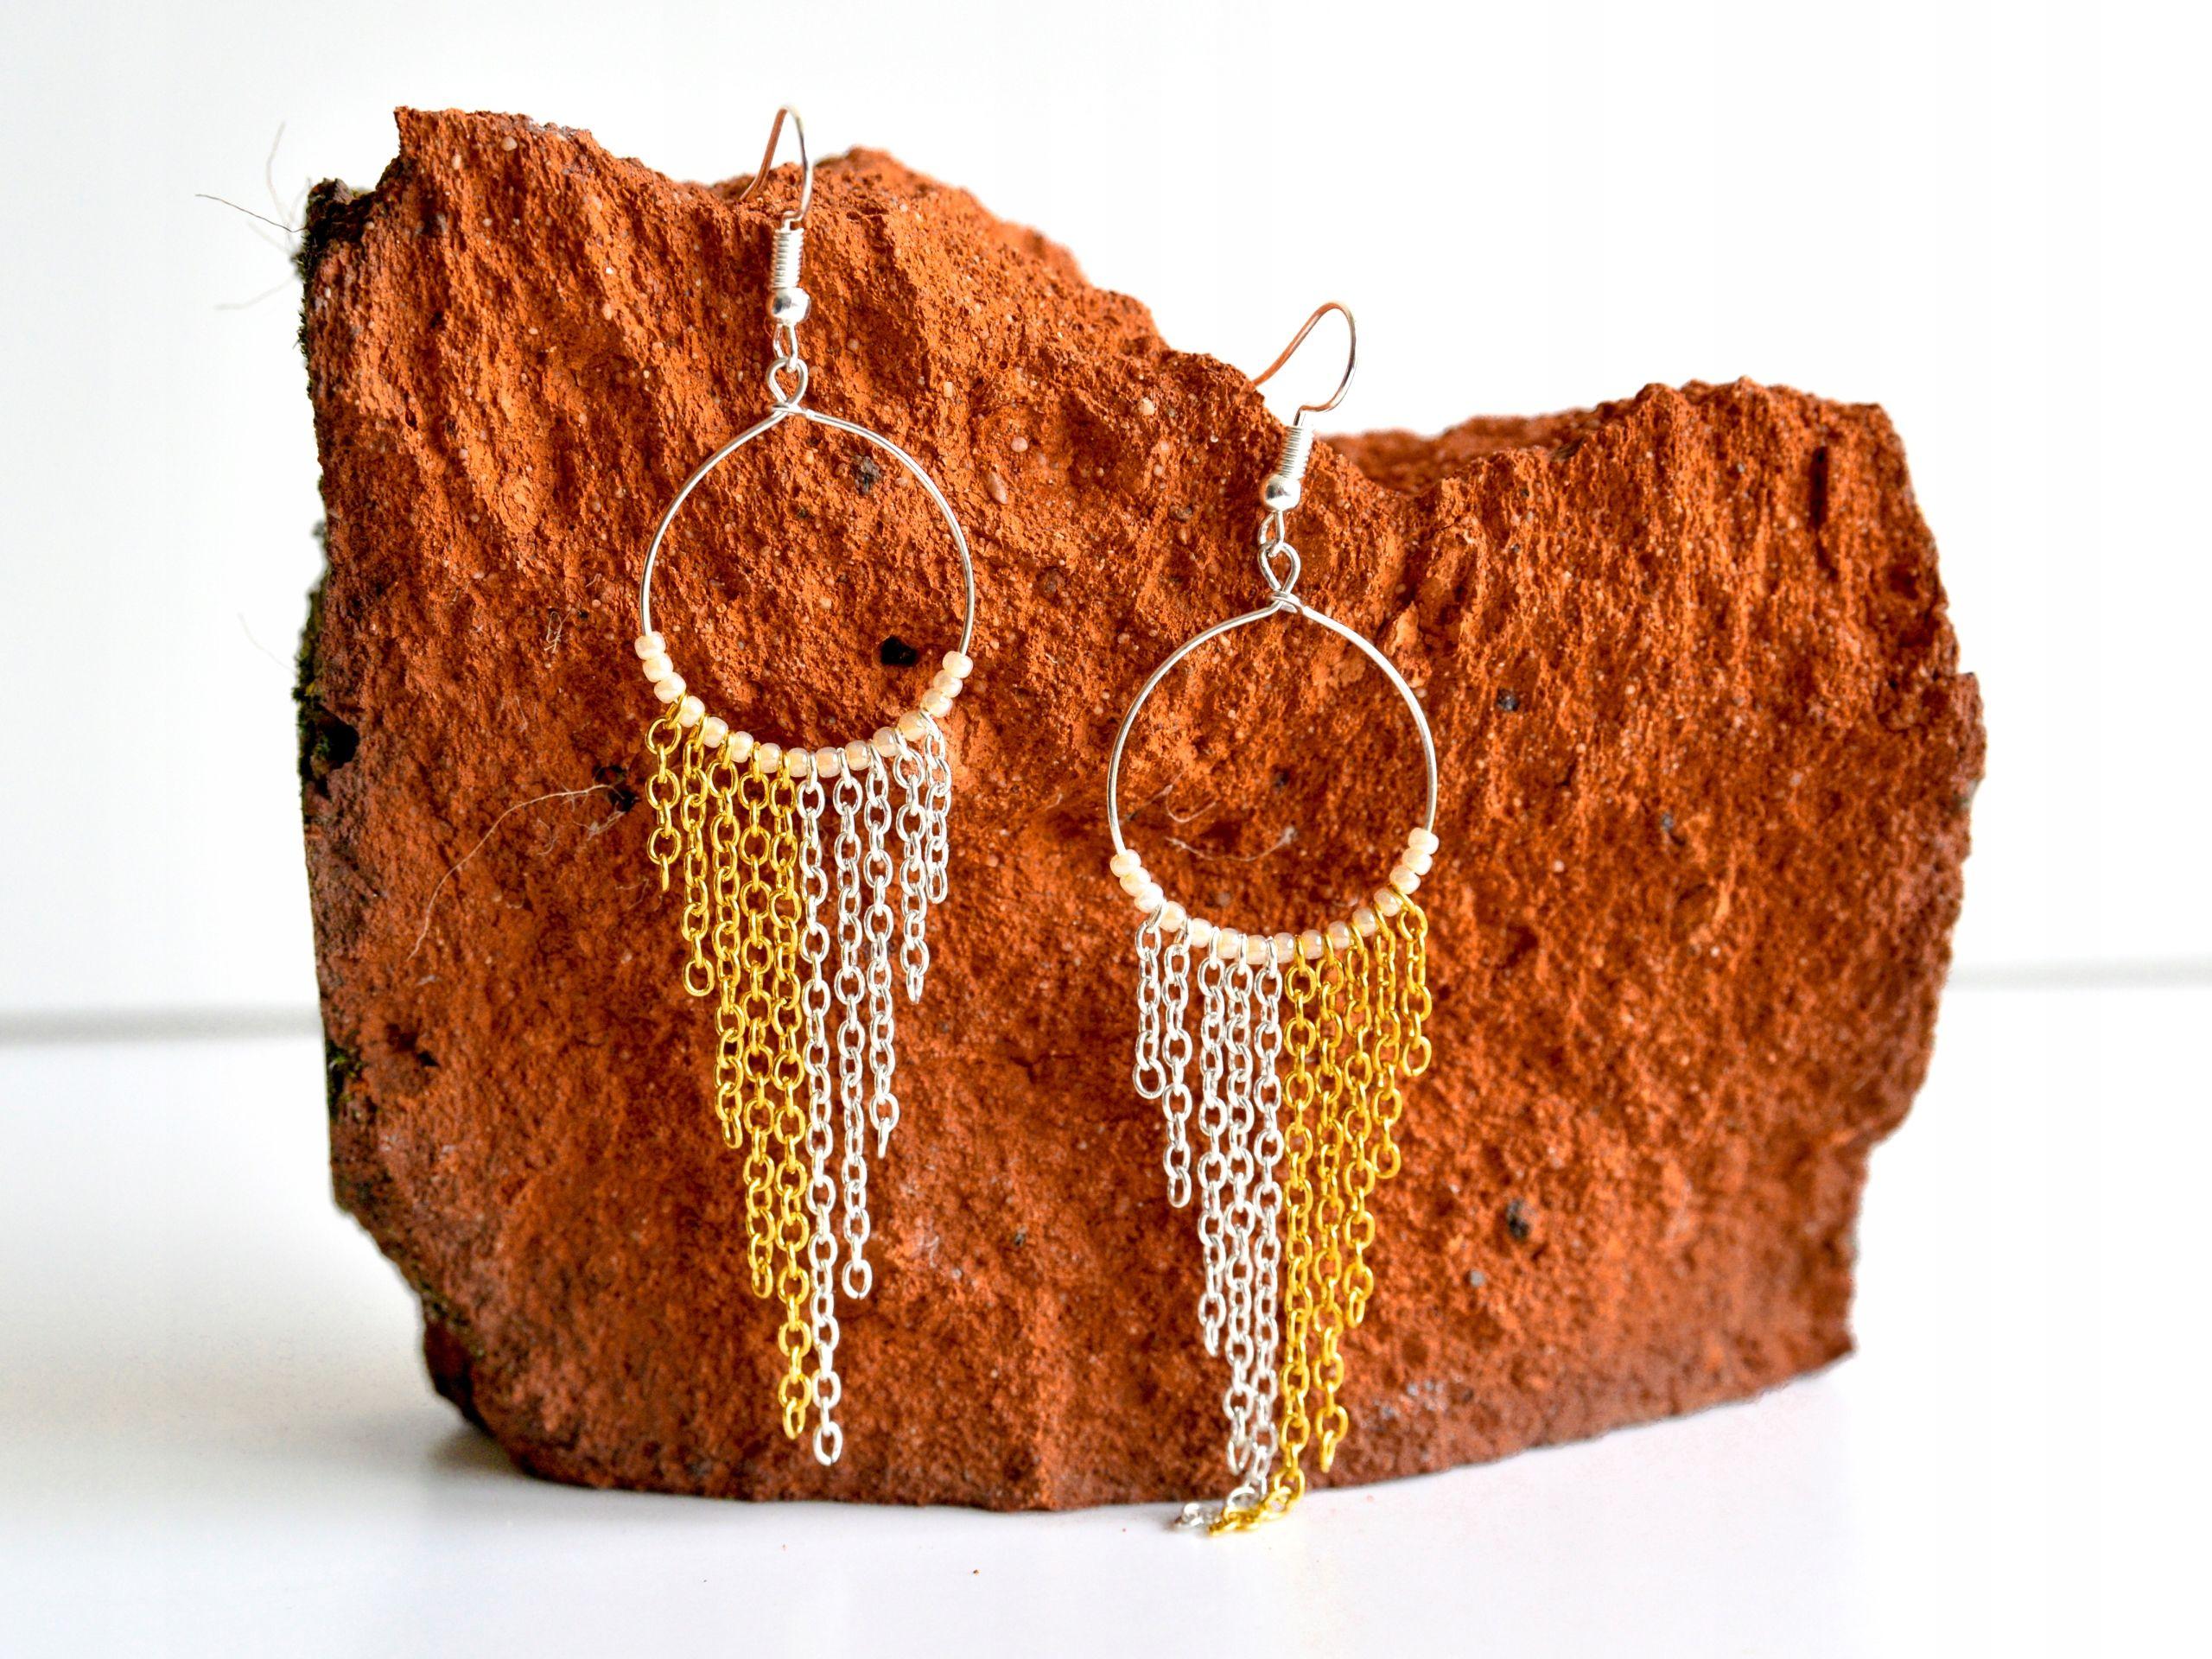 Kolczyki Wiszace Kola Zlote Lancuszki Boho Etno 7456286121 Oficjalne Archiwum Allegro Crochet Earrings Earrings Straw Bag